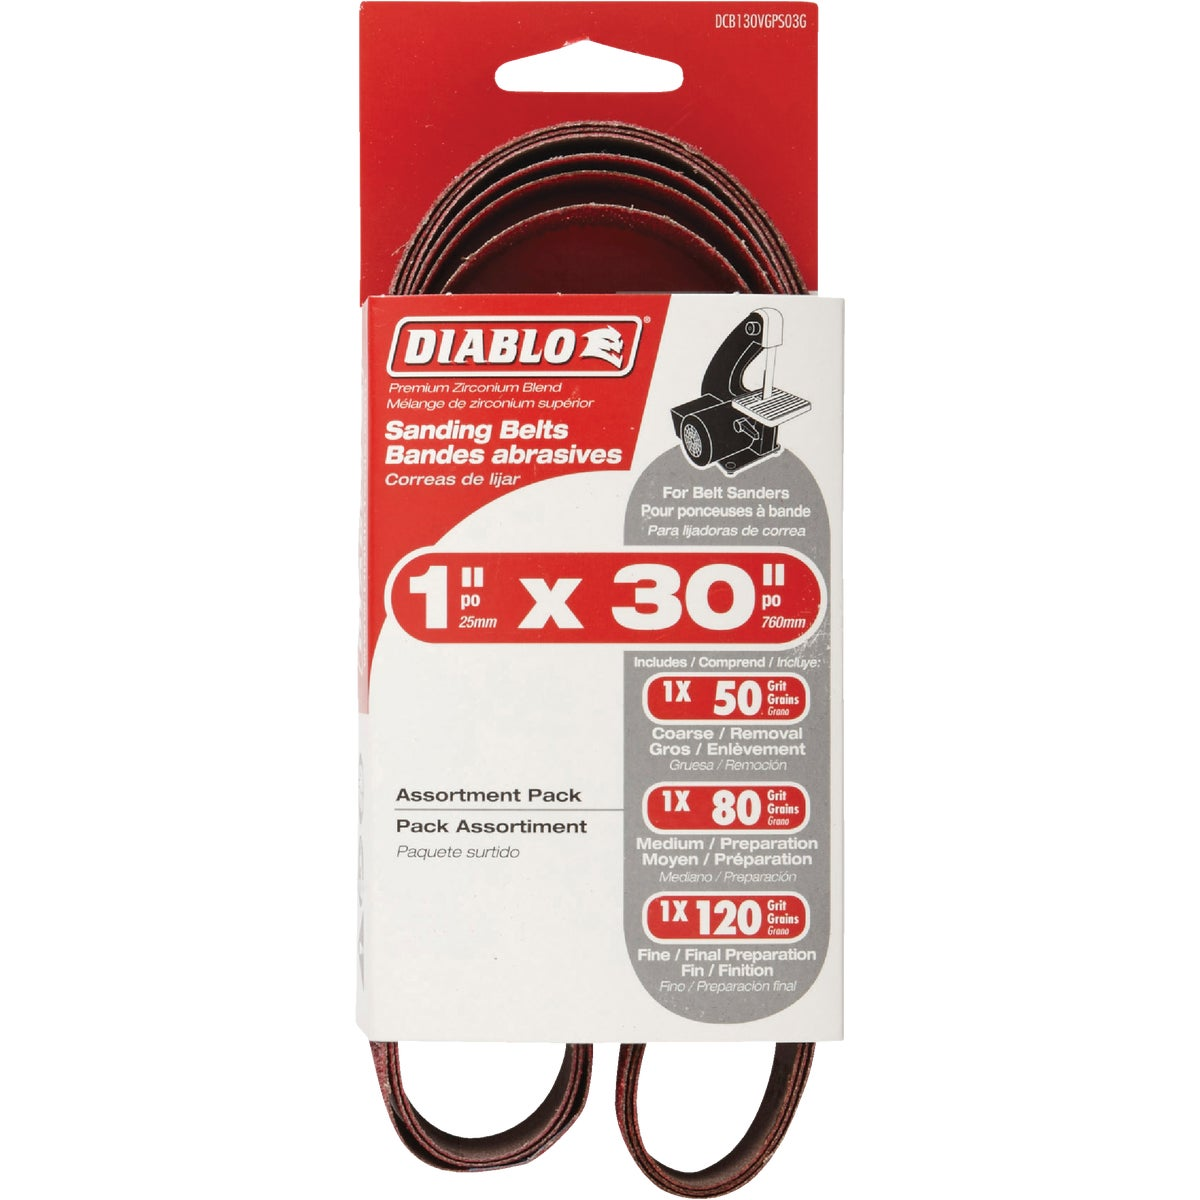 Freud DCB130VGPS03G Sanding Belt 1 x 30